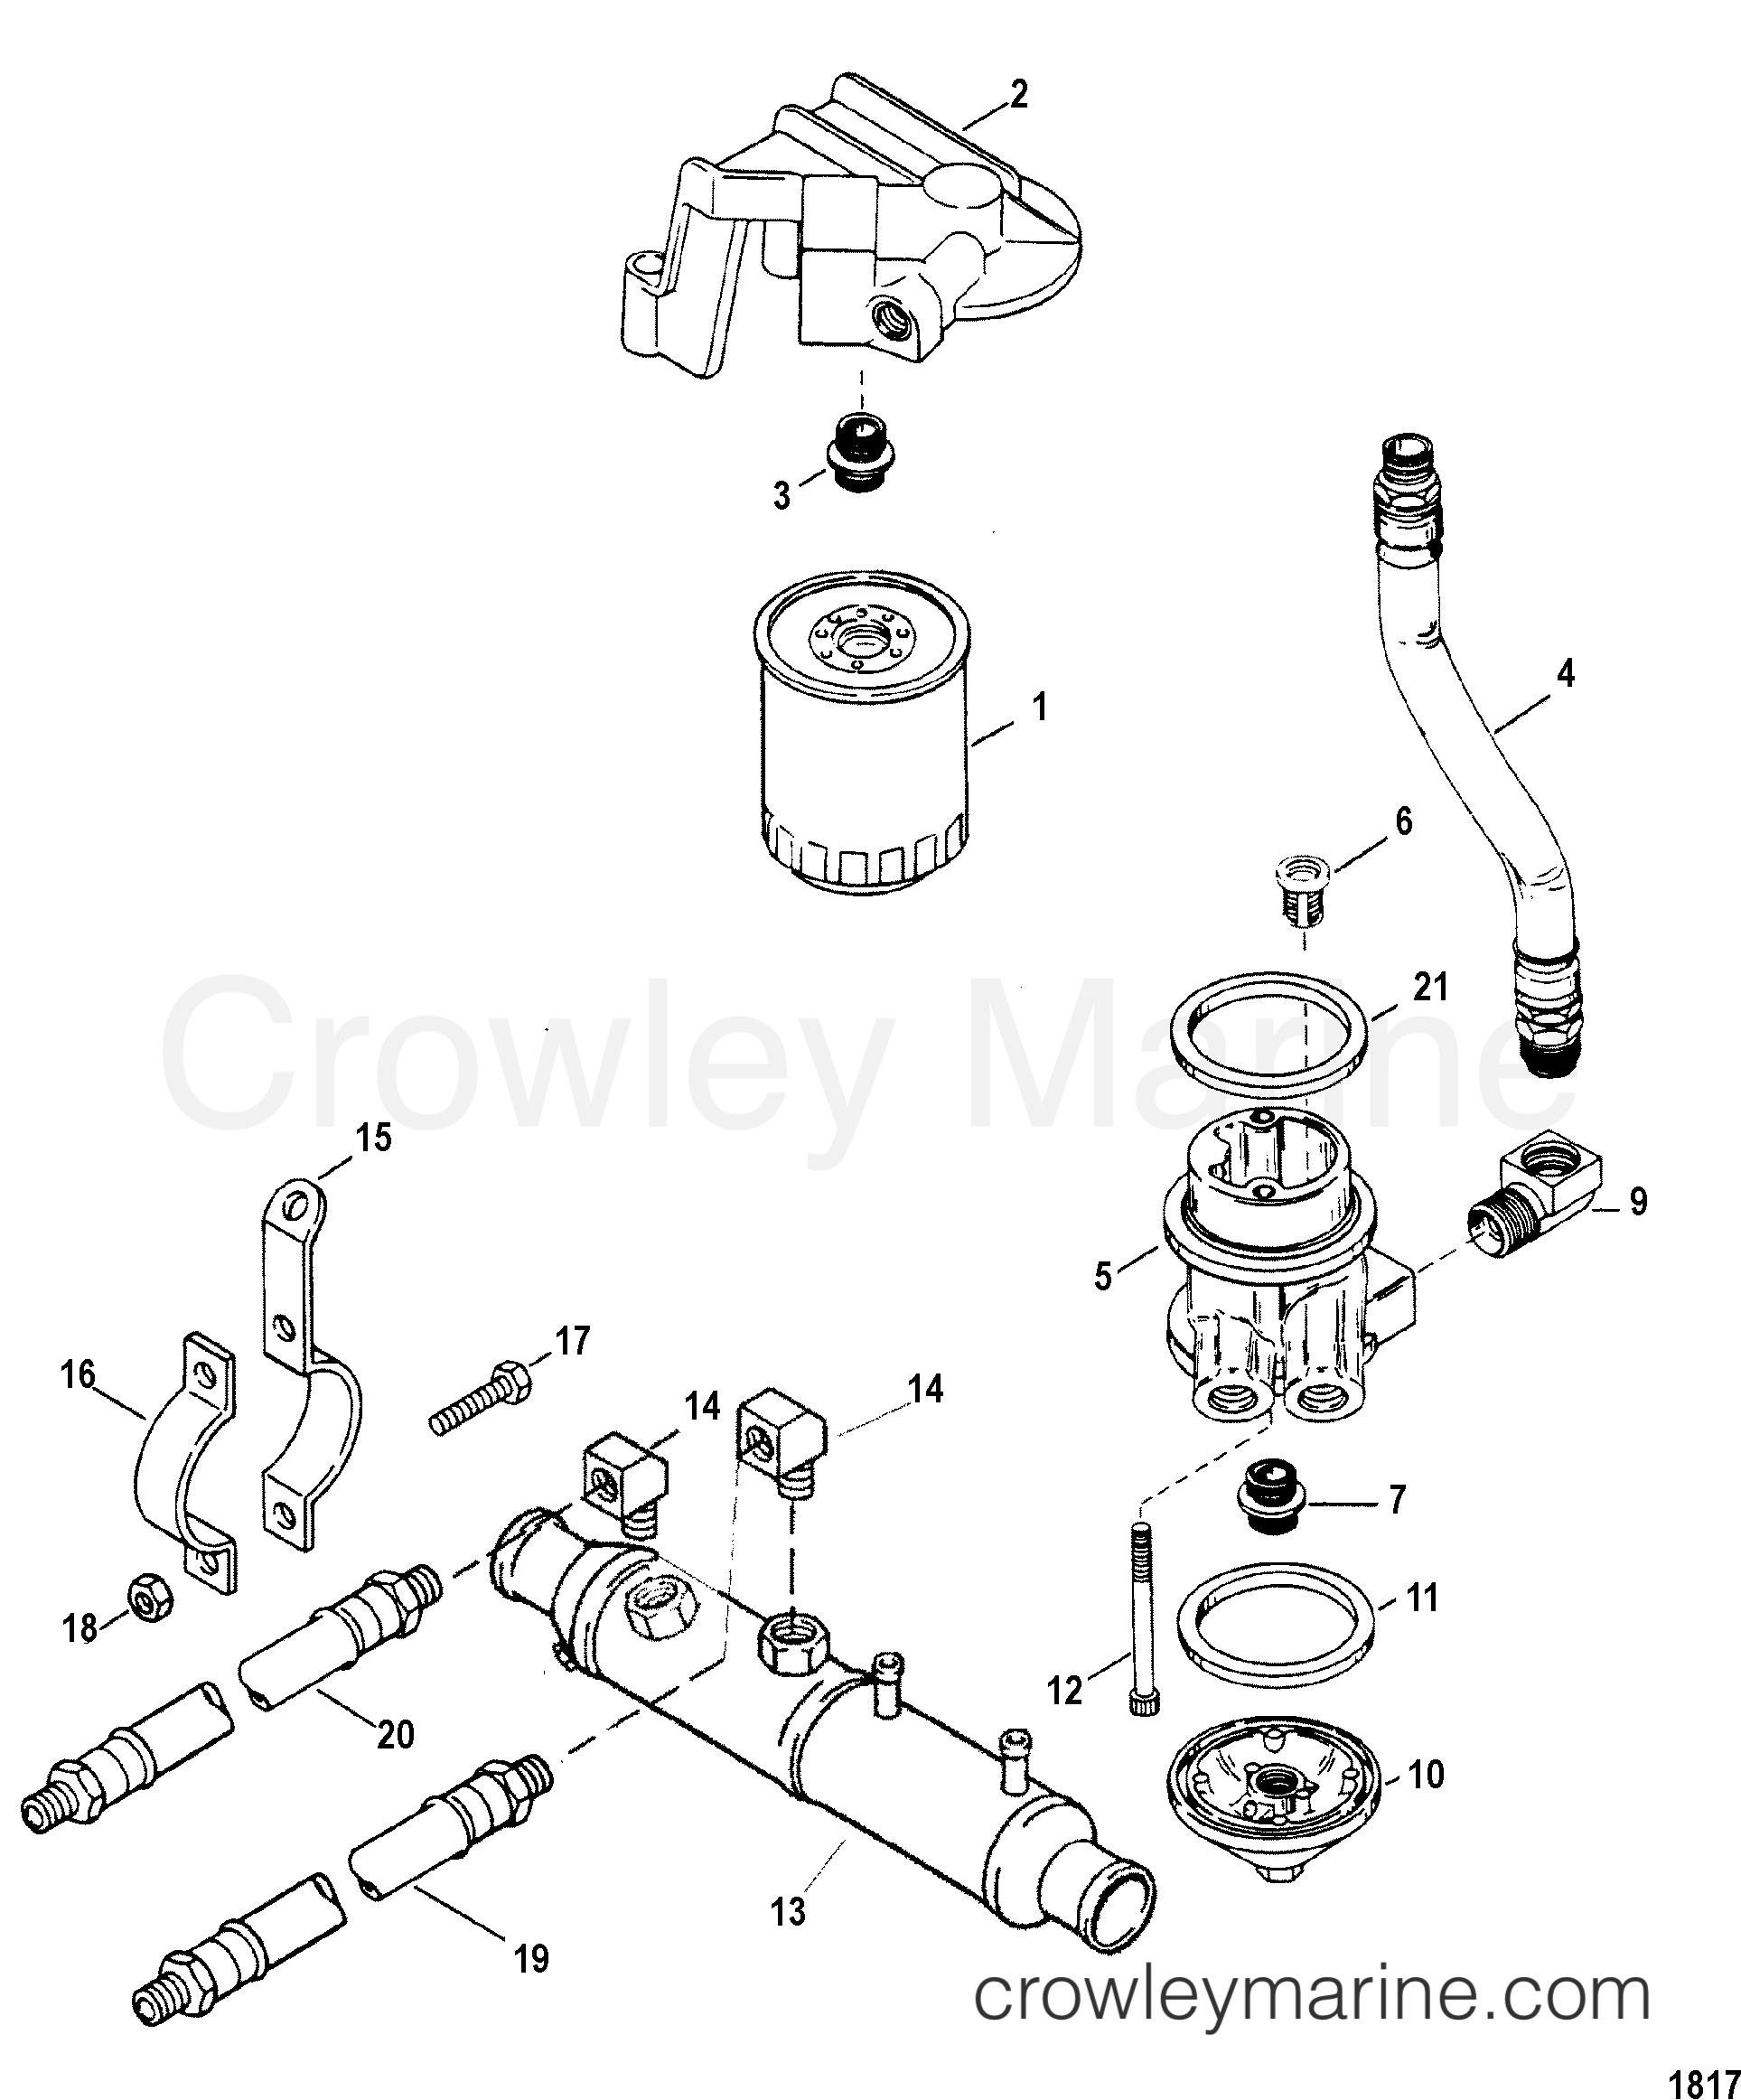 Oil Filter And Adapter 1988 Mercruiser 7 4l Bravo